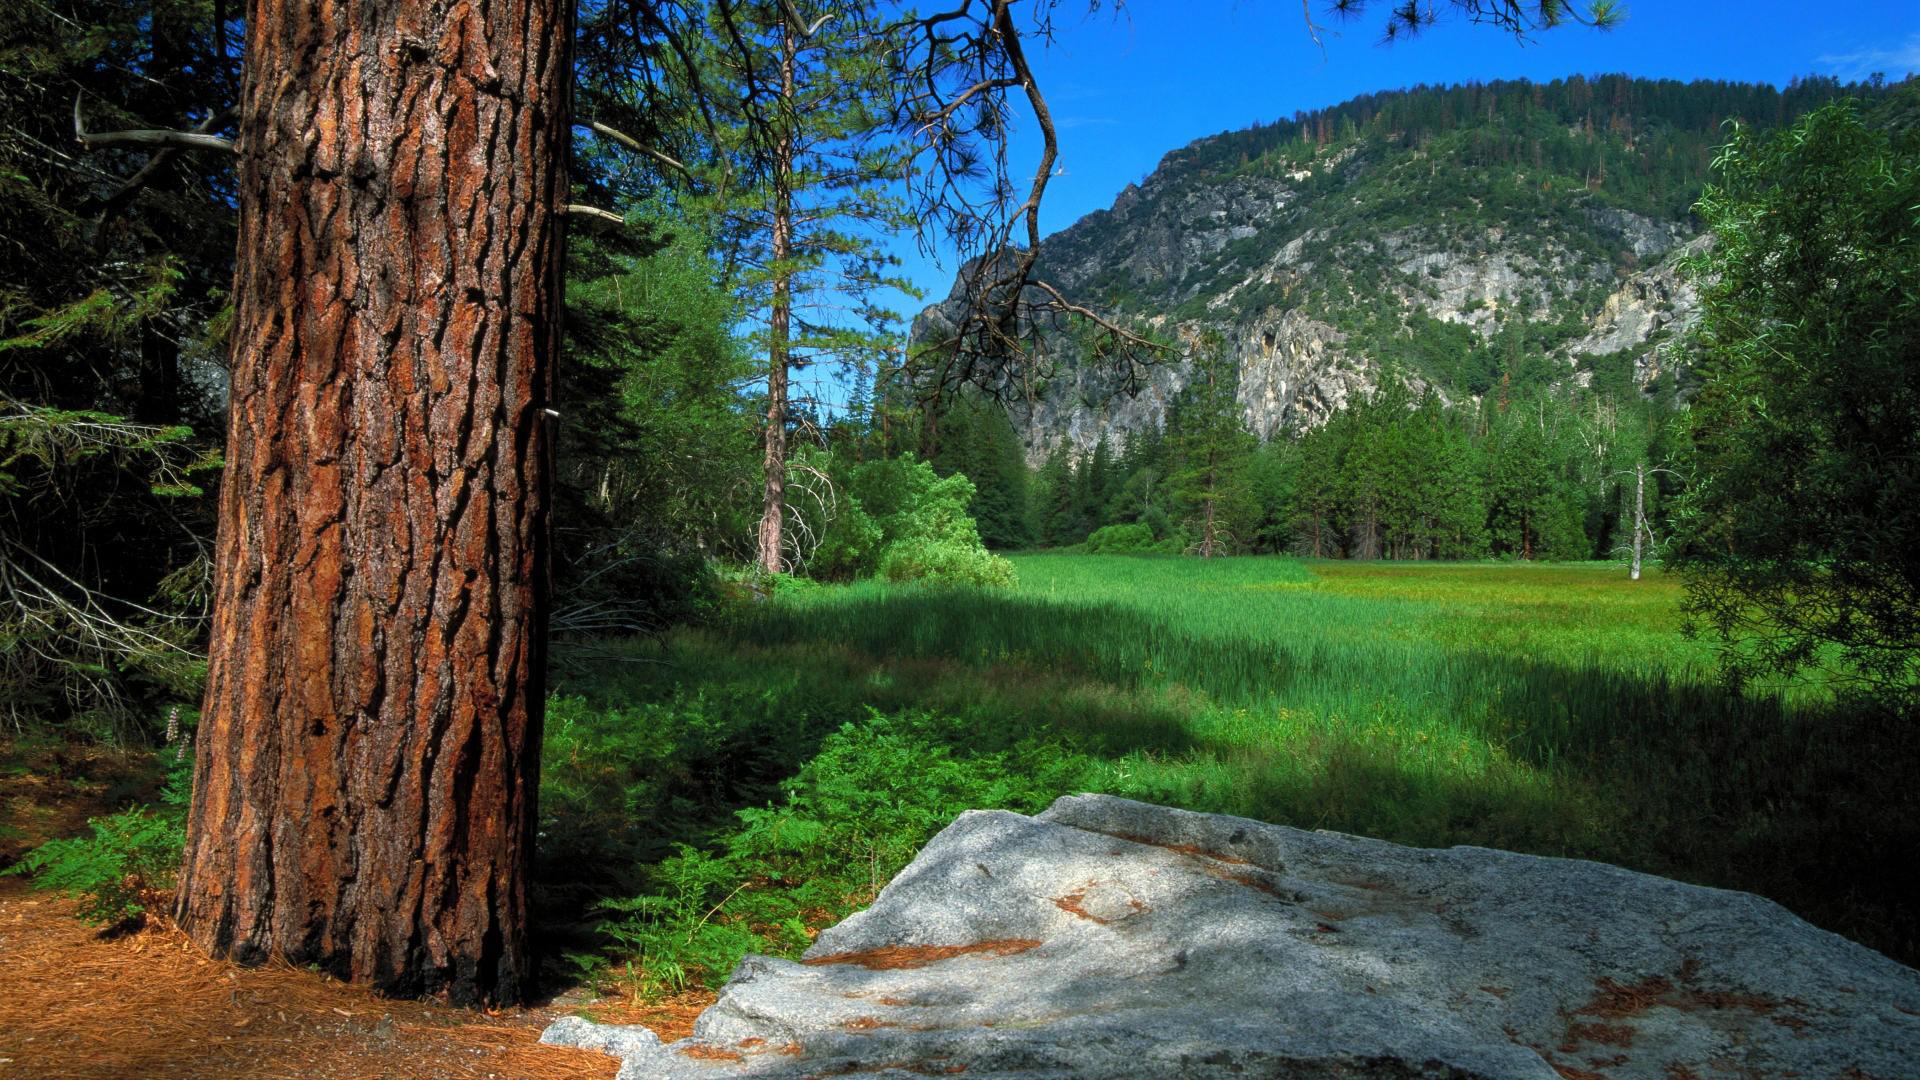 Yosemite Wallpaper Hd Desktop Wallpapers 4k Hd